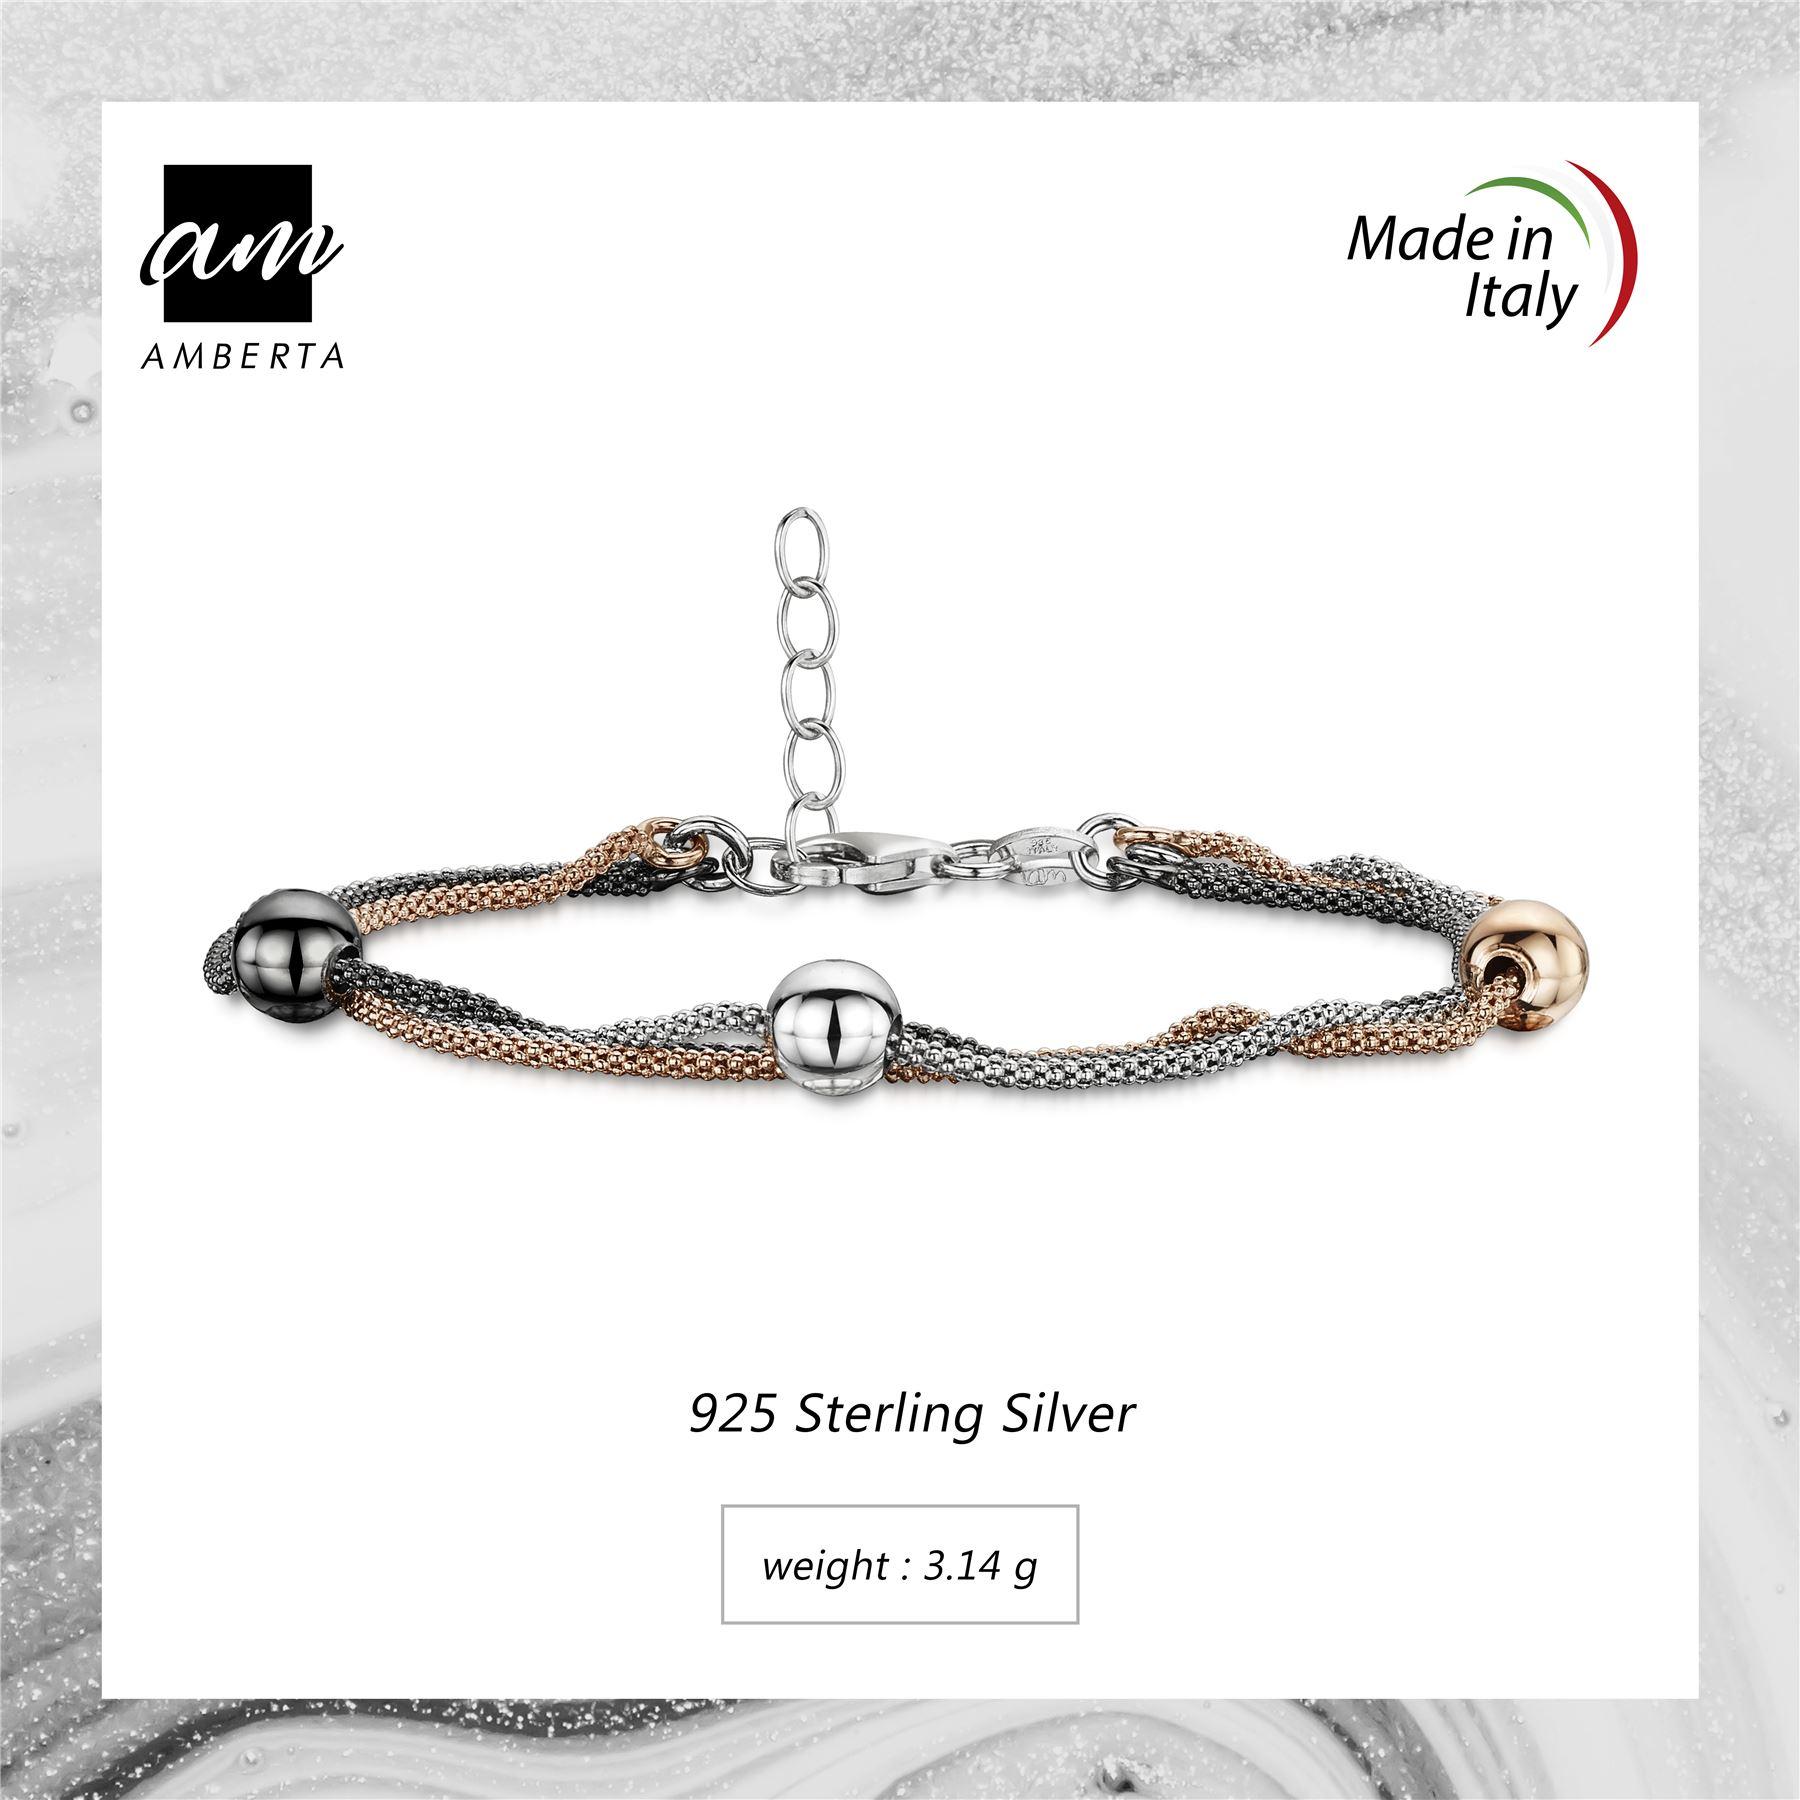 Amberta-925-Sterling-Silver-Adjustable-Multi-Layered-Chain-Bracelet-for-Women miniature 5